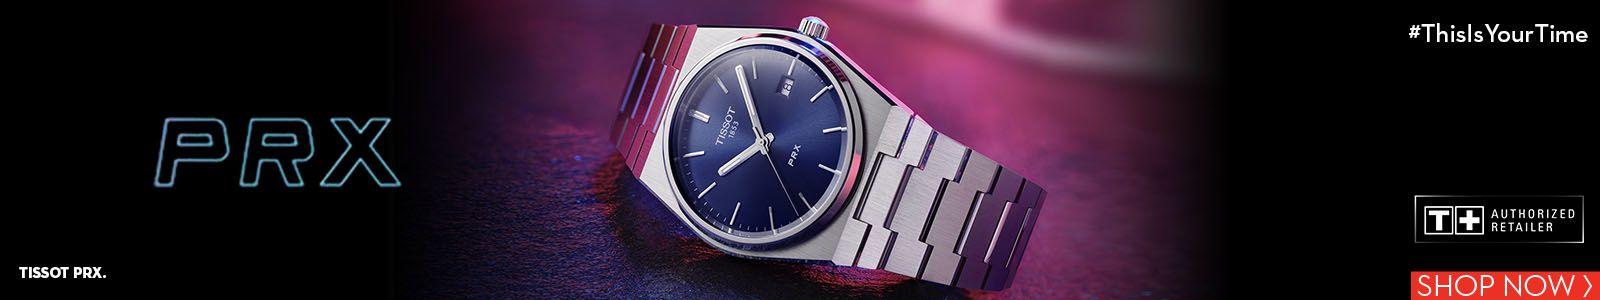 Prx, Tissot Prx, #Thisis Your Time, Shop Now